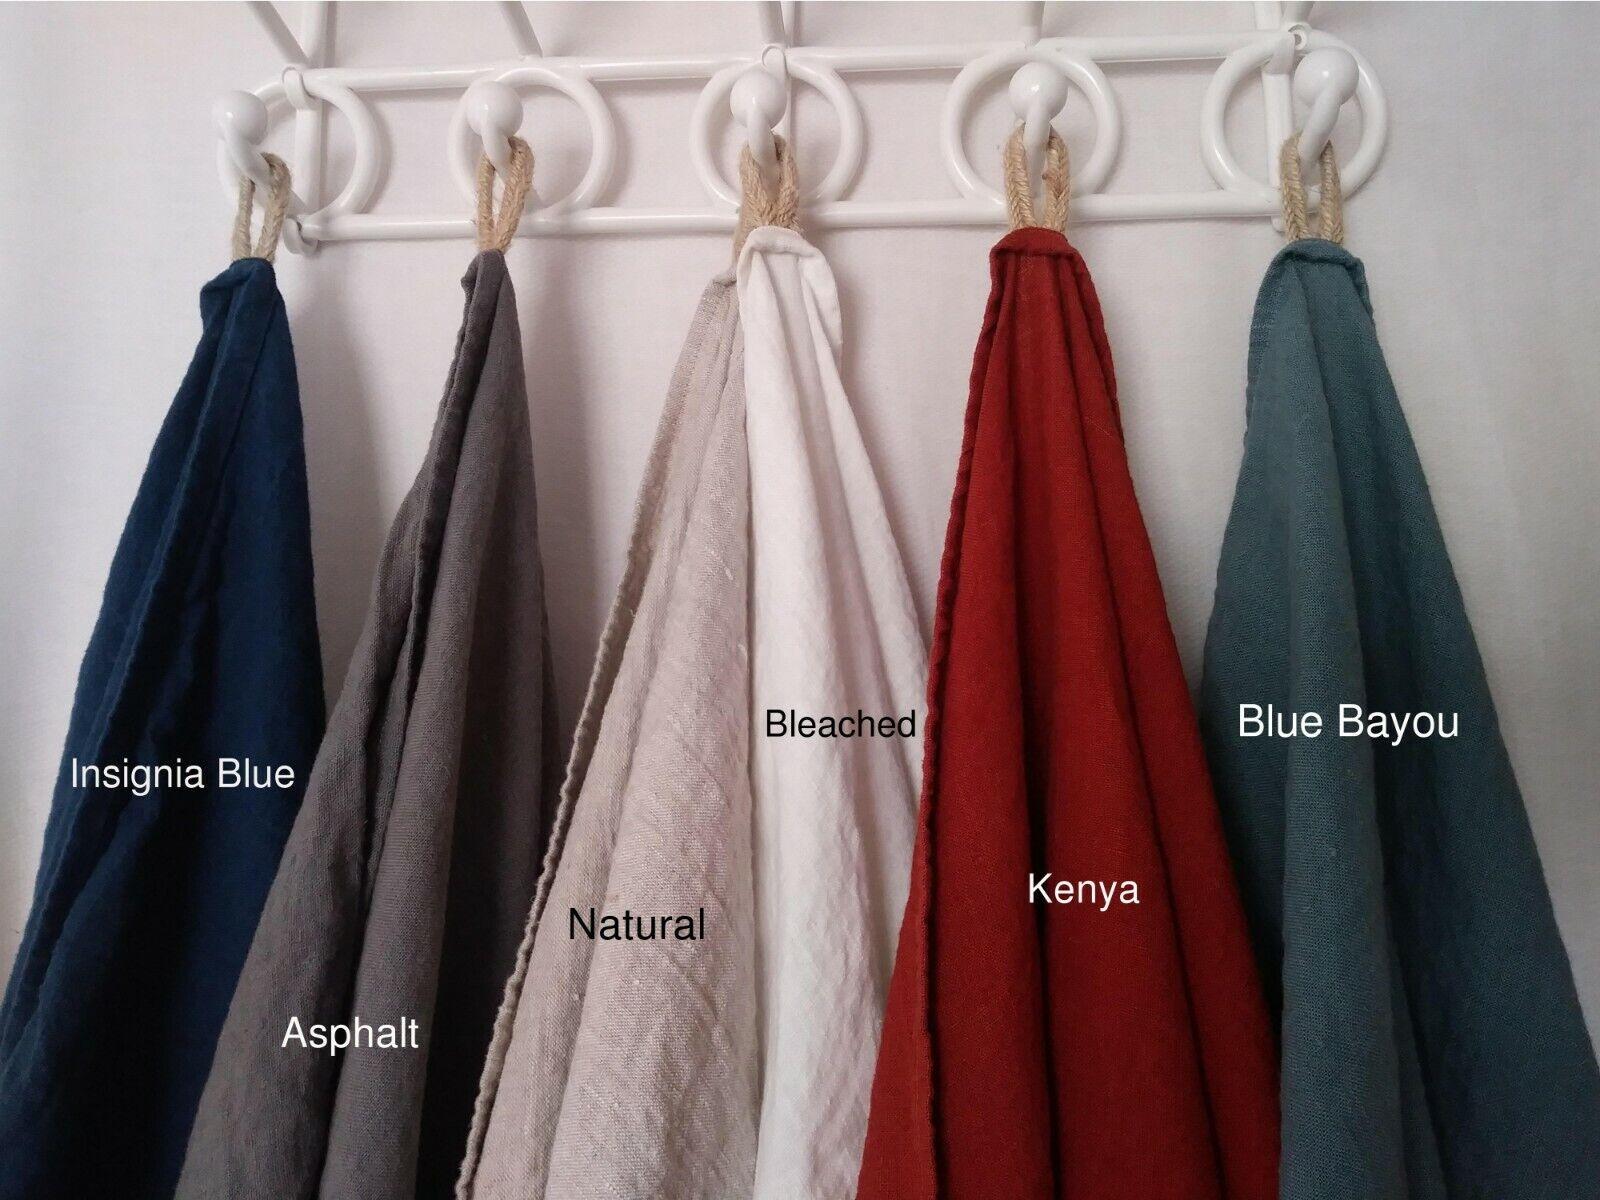 Linen Bedspread Linen Bedding, Rustic, Twin, Full, Queen, King Coverlet, Summer